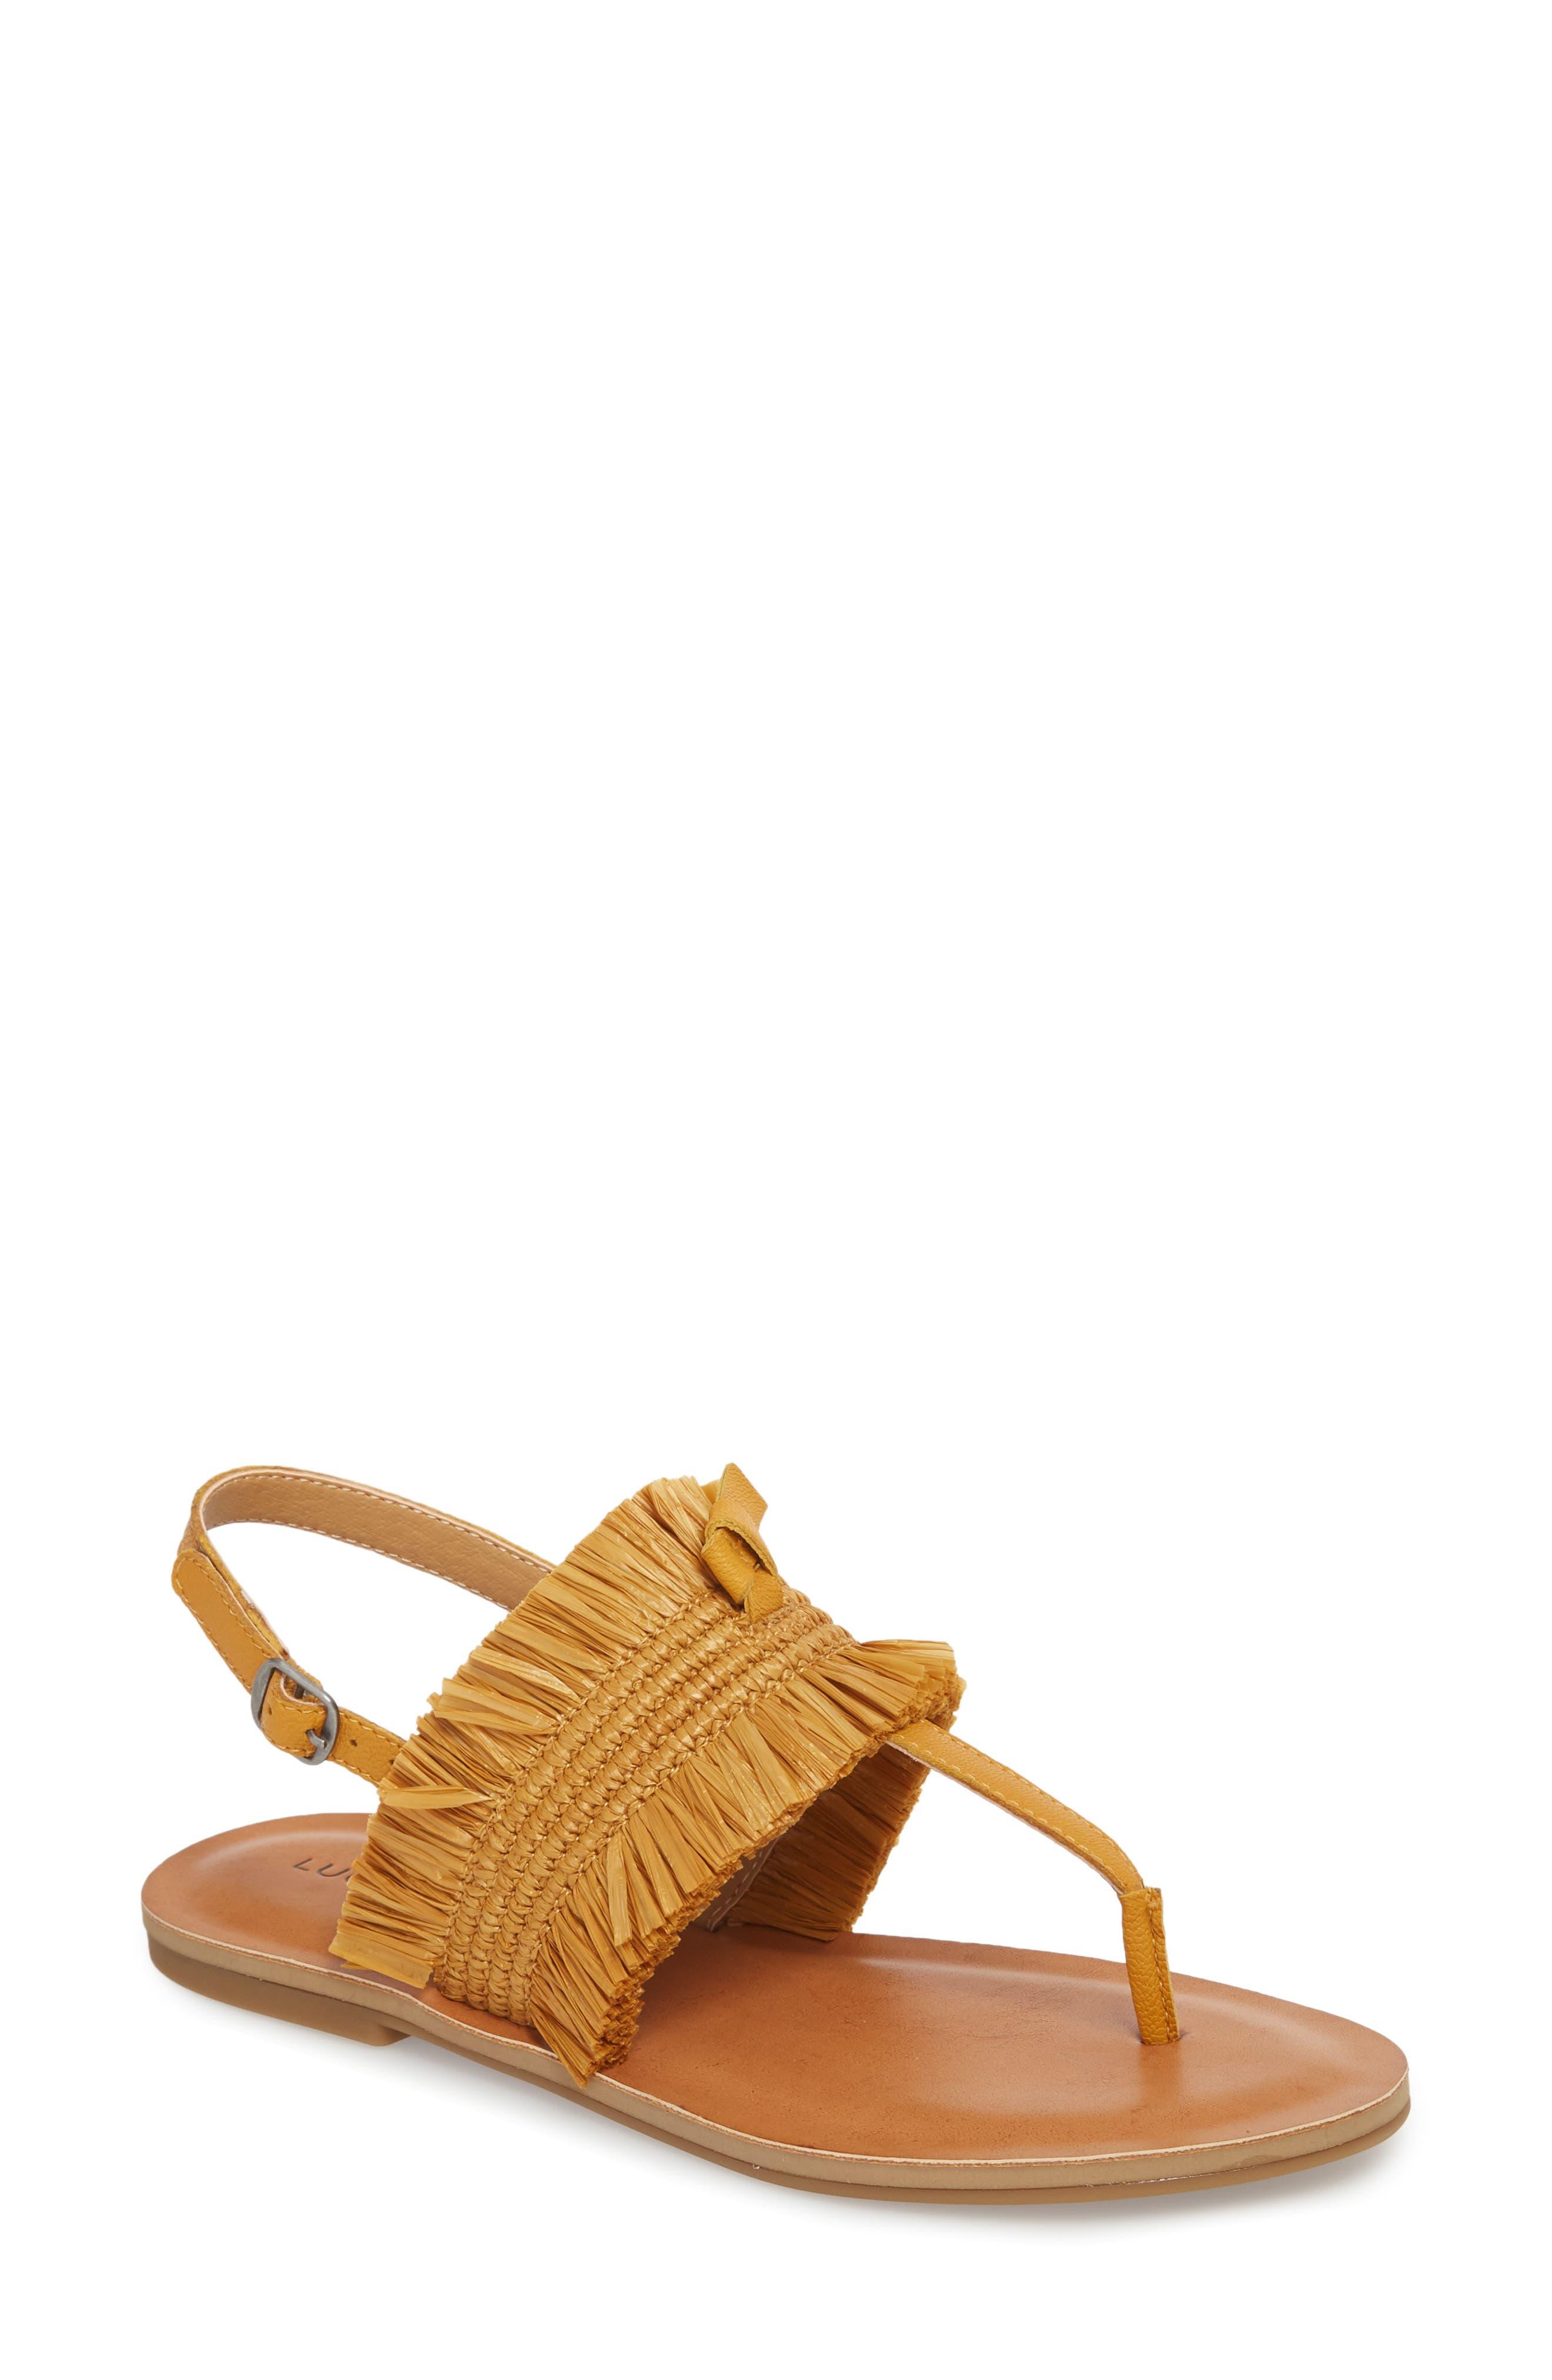 Akerlei Sandal,                         Main,                         color, Saffron Leather